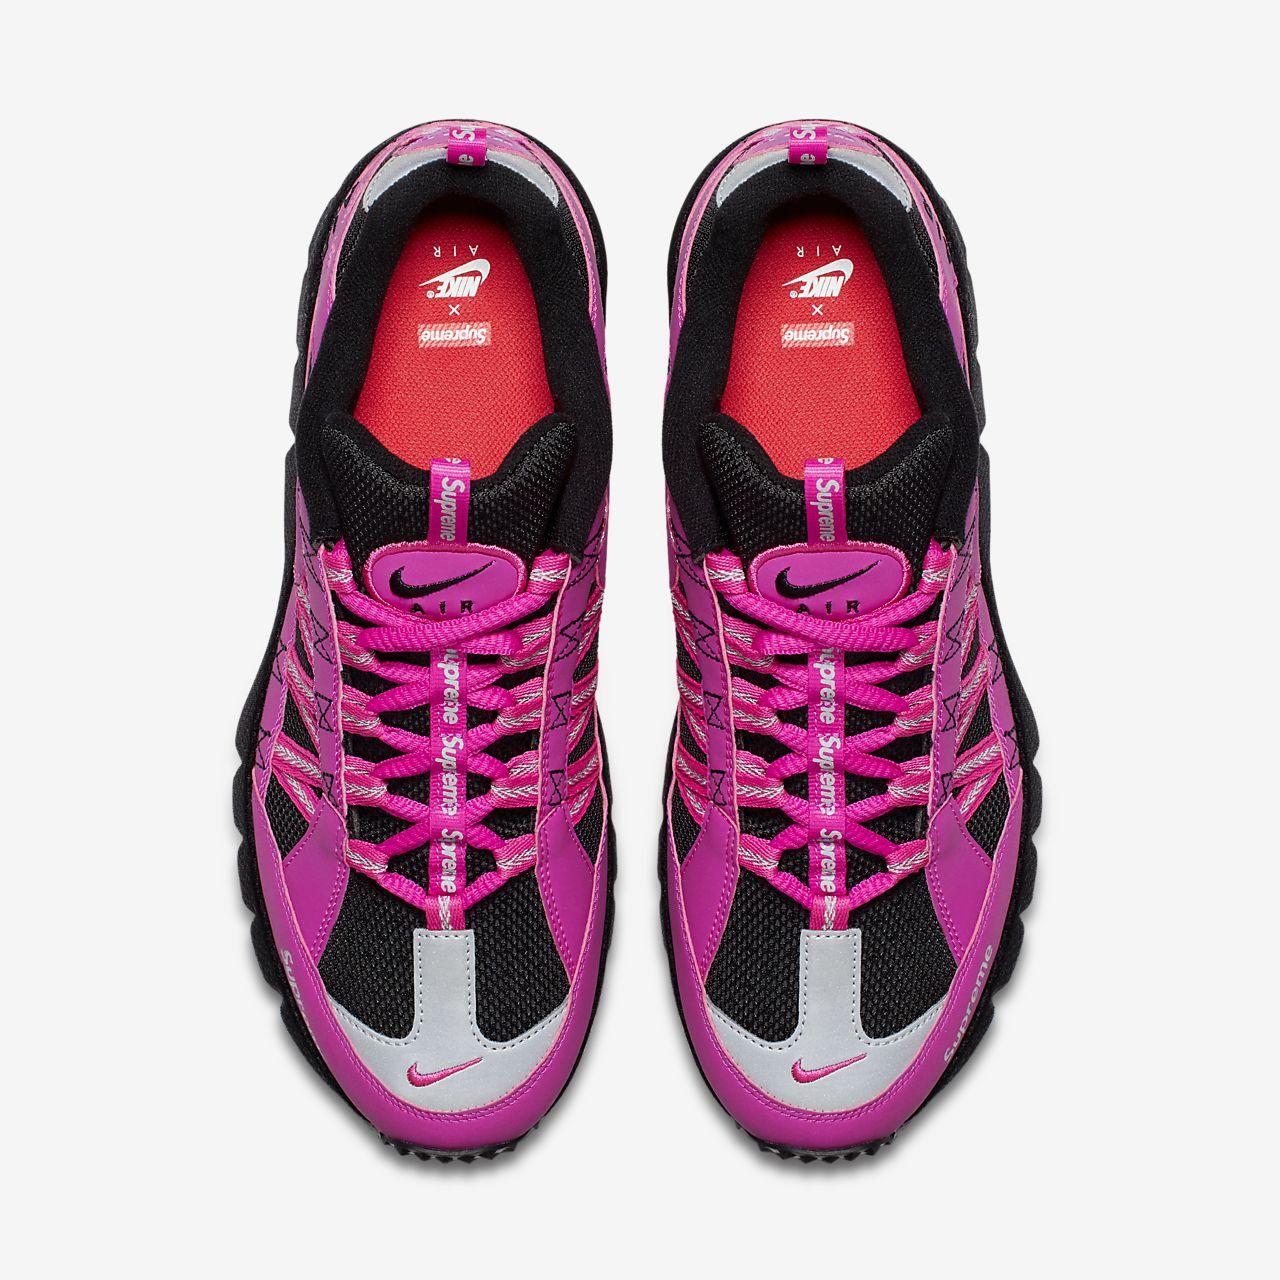 f76afea3 NikeLab Air Humara '17 x Supreme Men's Trail Running Shoe. Nike.com MY